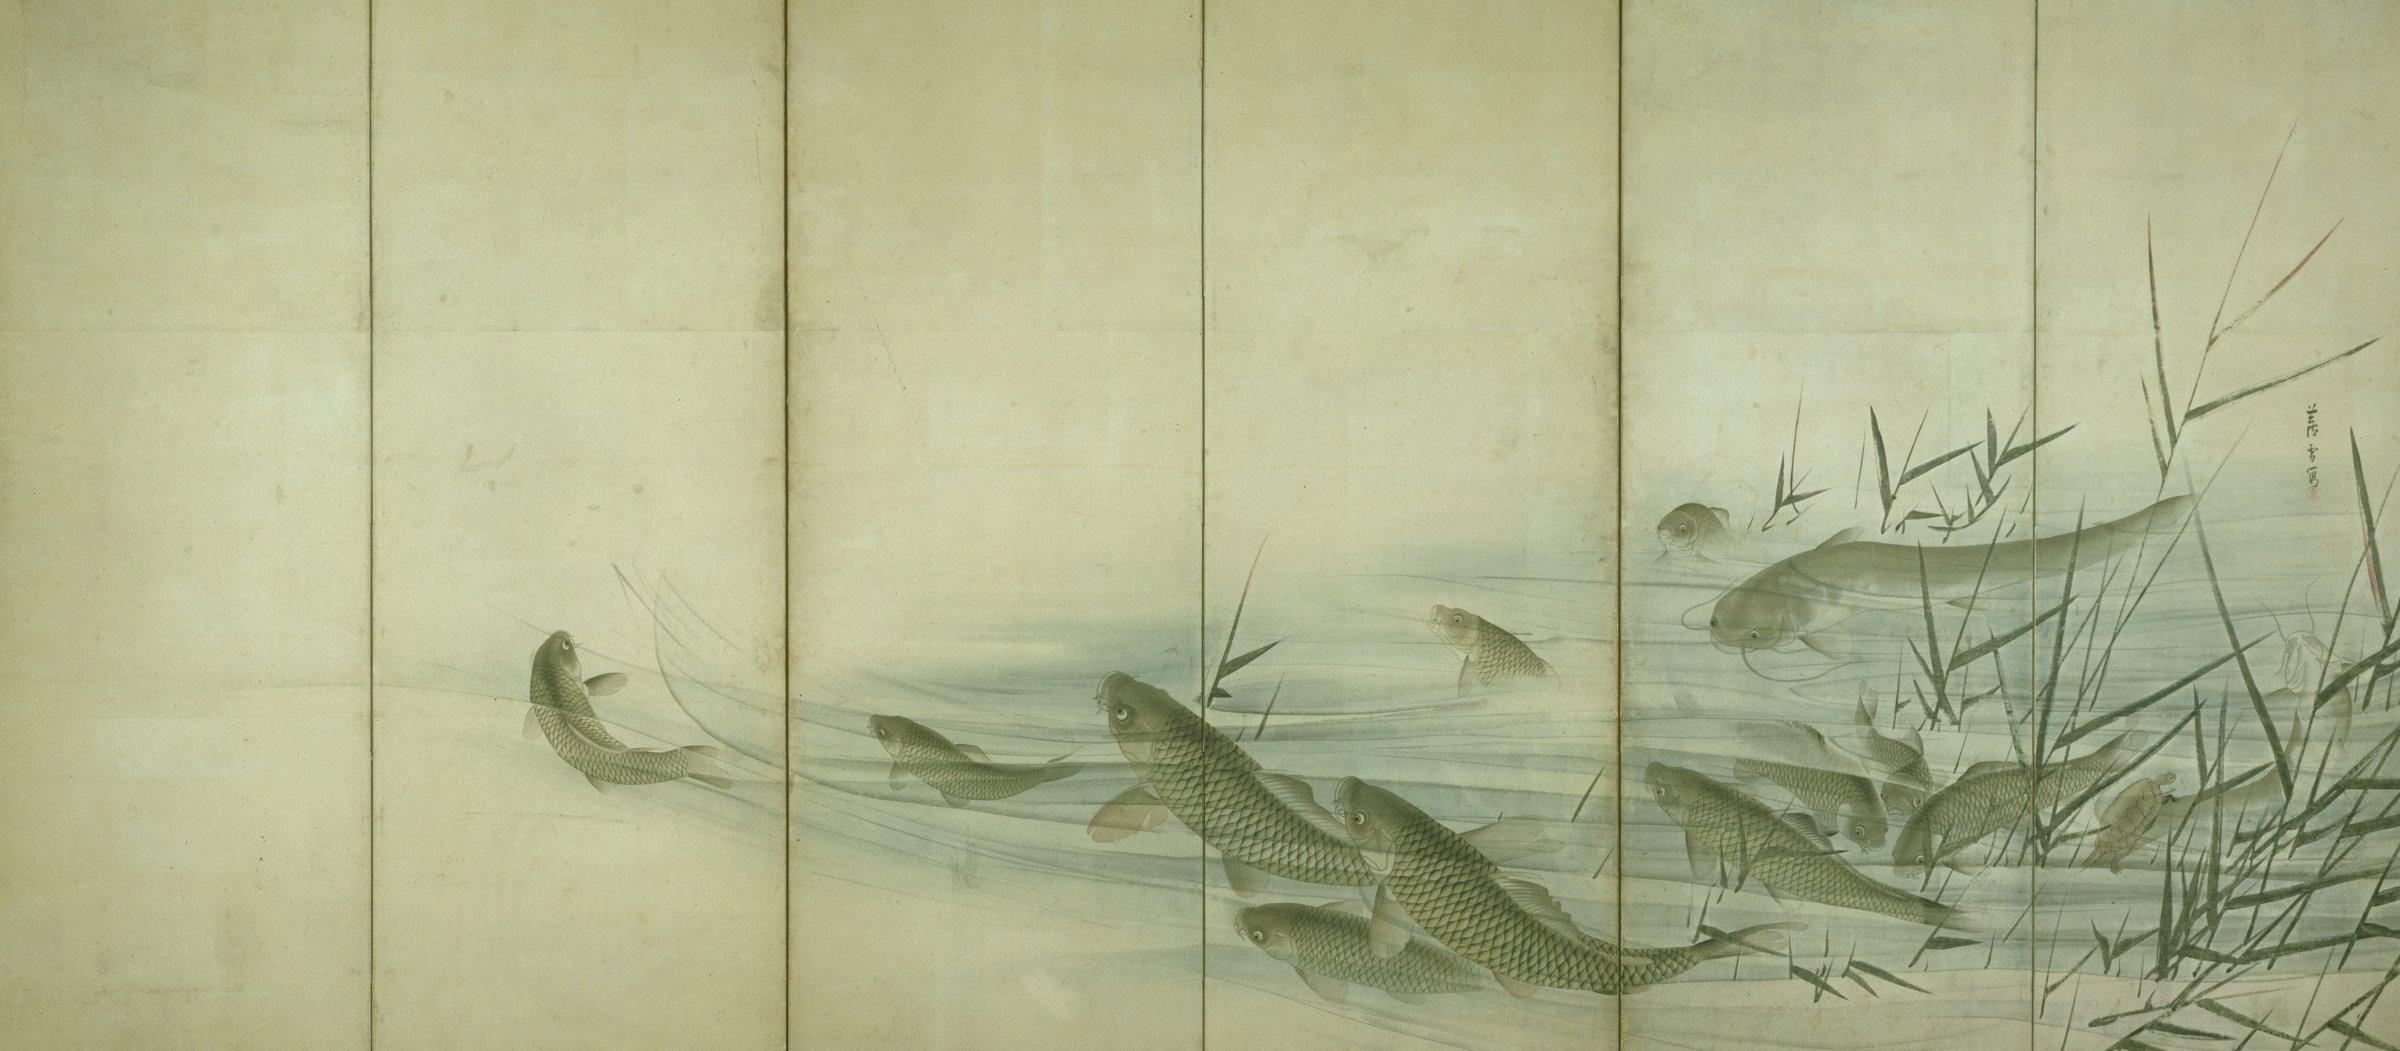 Swimming Carp, Catfish, and Tortoise Among Reeds, Nagasawa Rosetsu, ink and color on paper